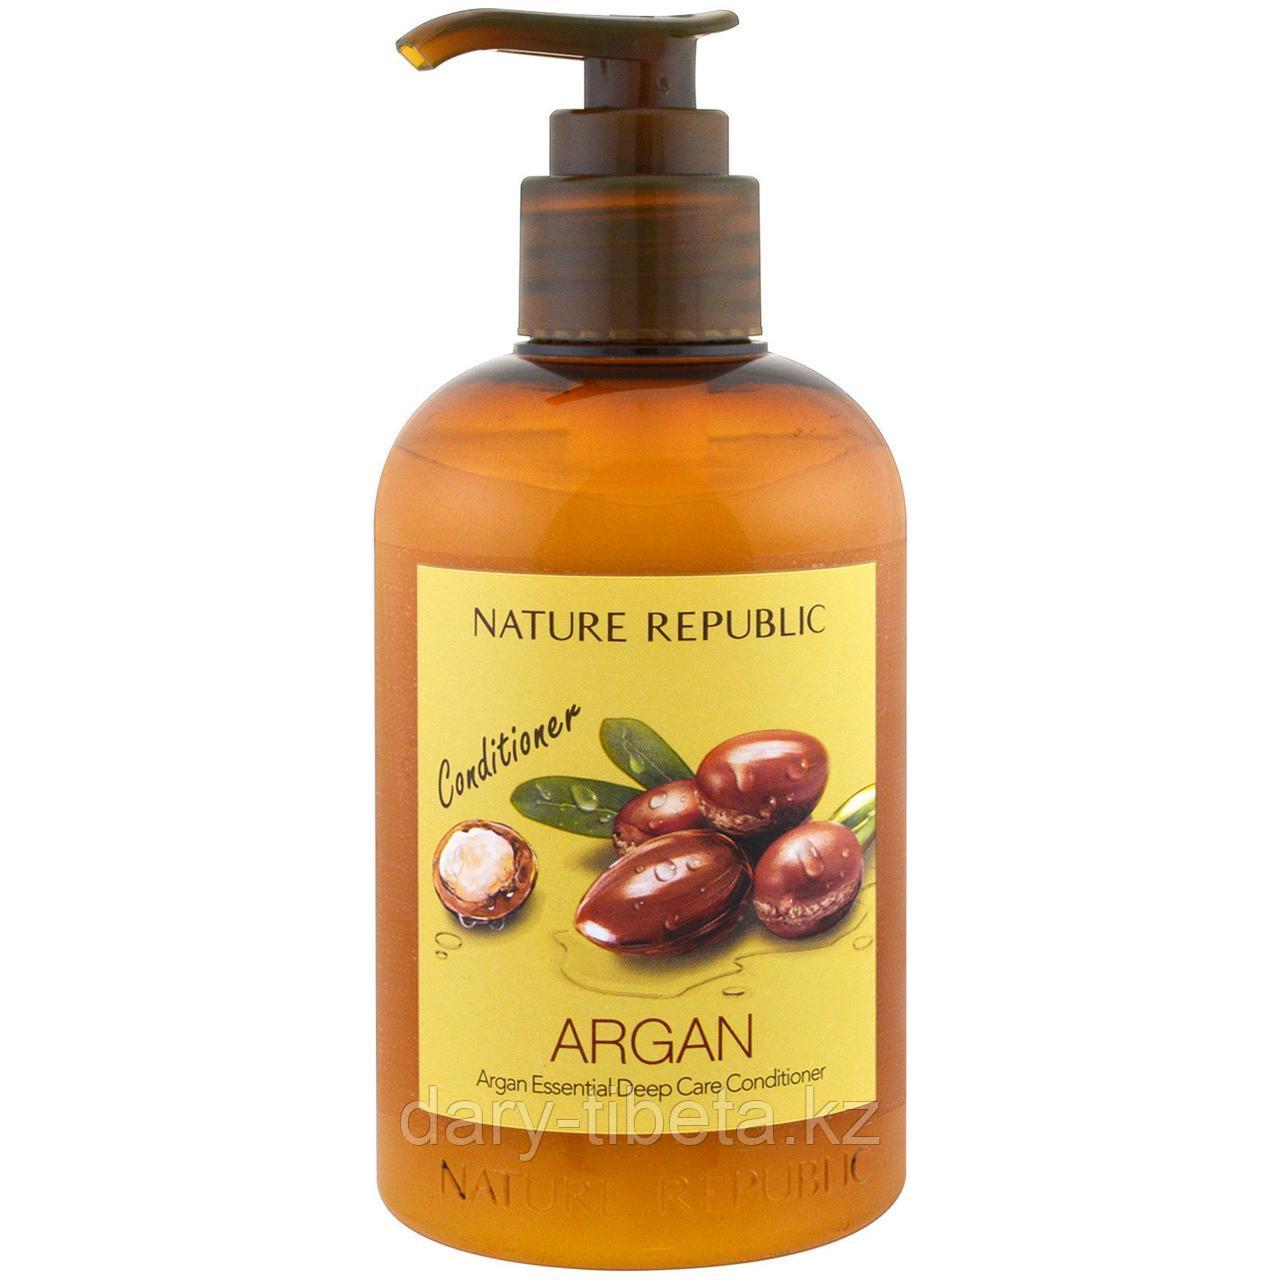 Nature Republic, Argan Essential Deep Care Conditioner- Восстанавливающий кондиционер